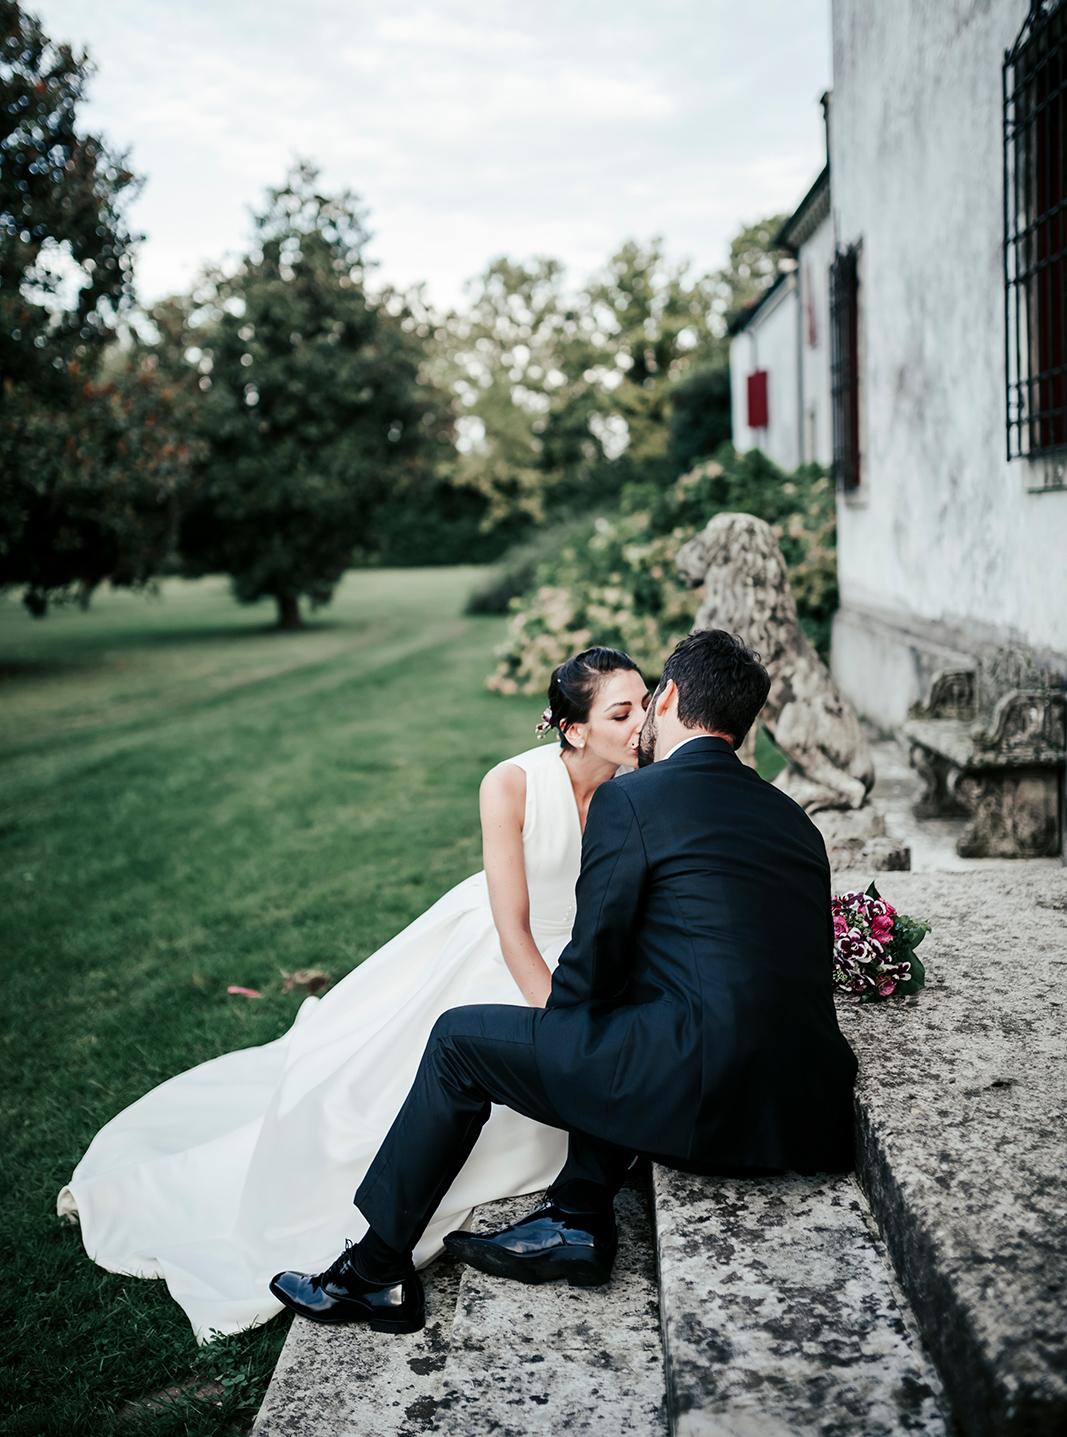 villa per matrimoni Vicenza, villa per matrimoni Padova, location matrimonio Vicenza, location matrimoni Vicenza,location shooting Vicenza, location shooting Padova